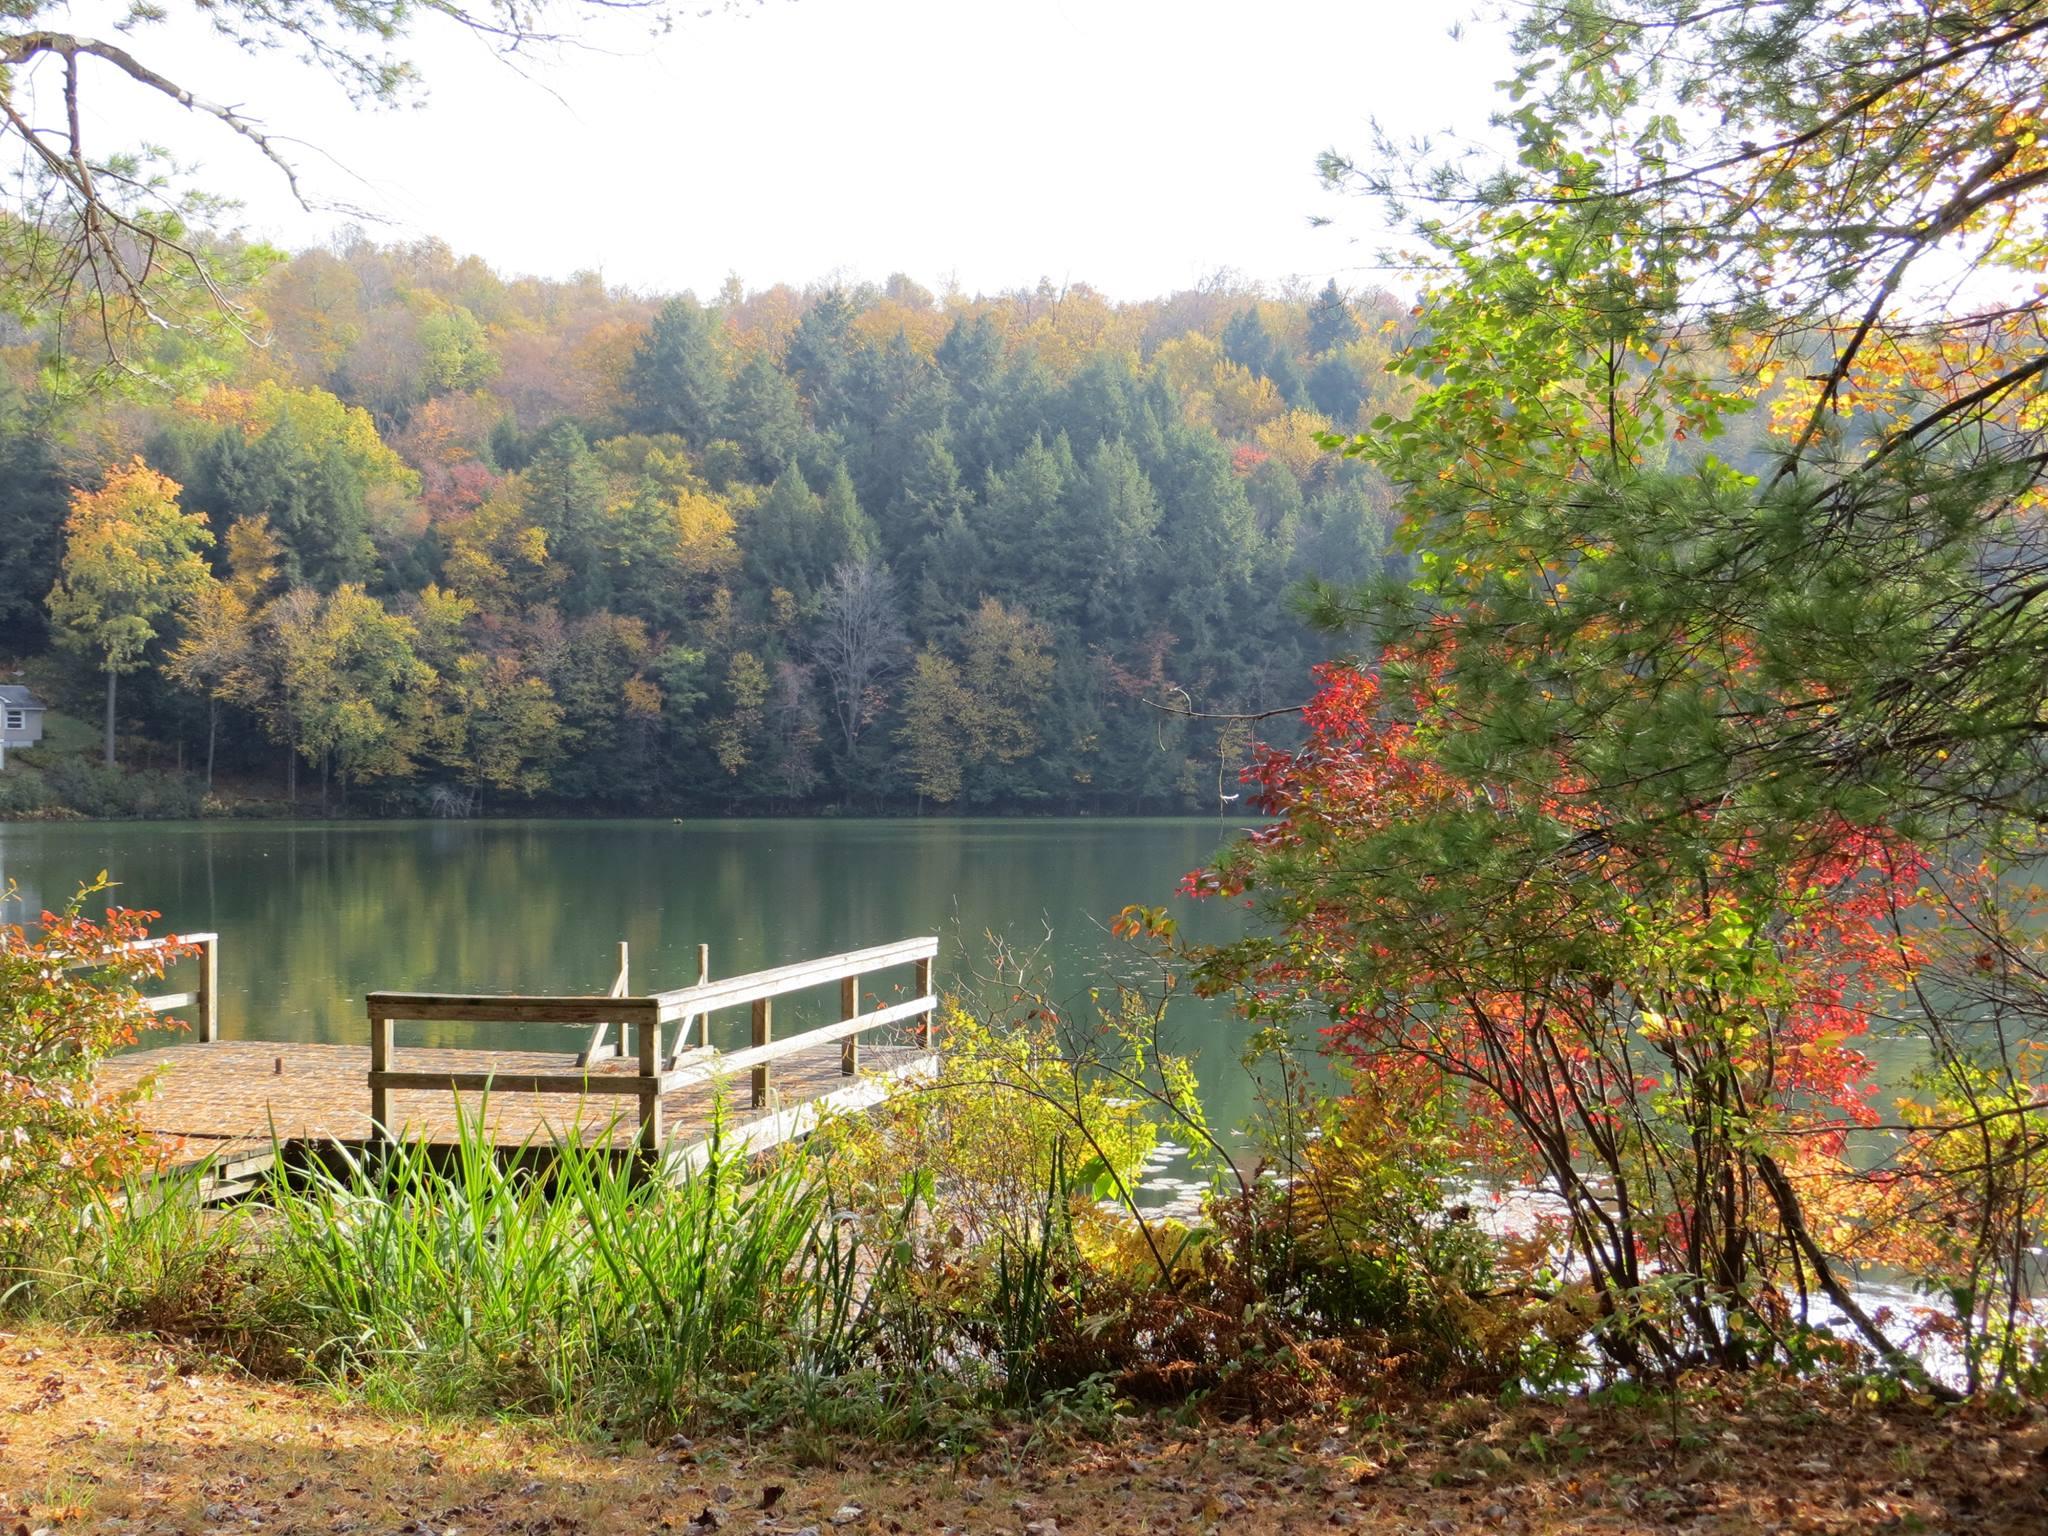 Dock on a lake in fall.